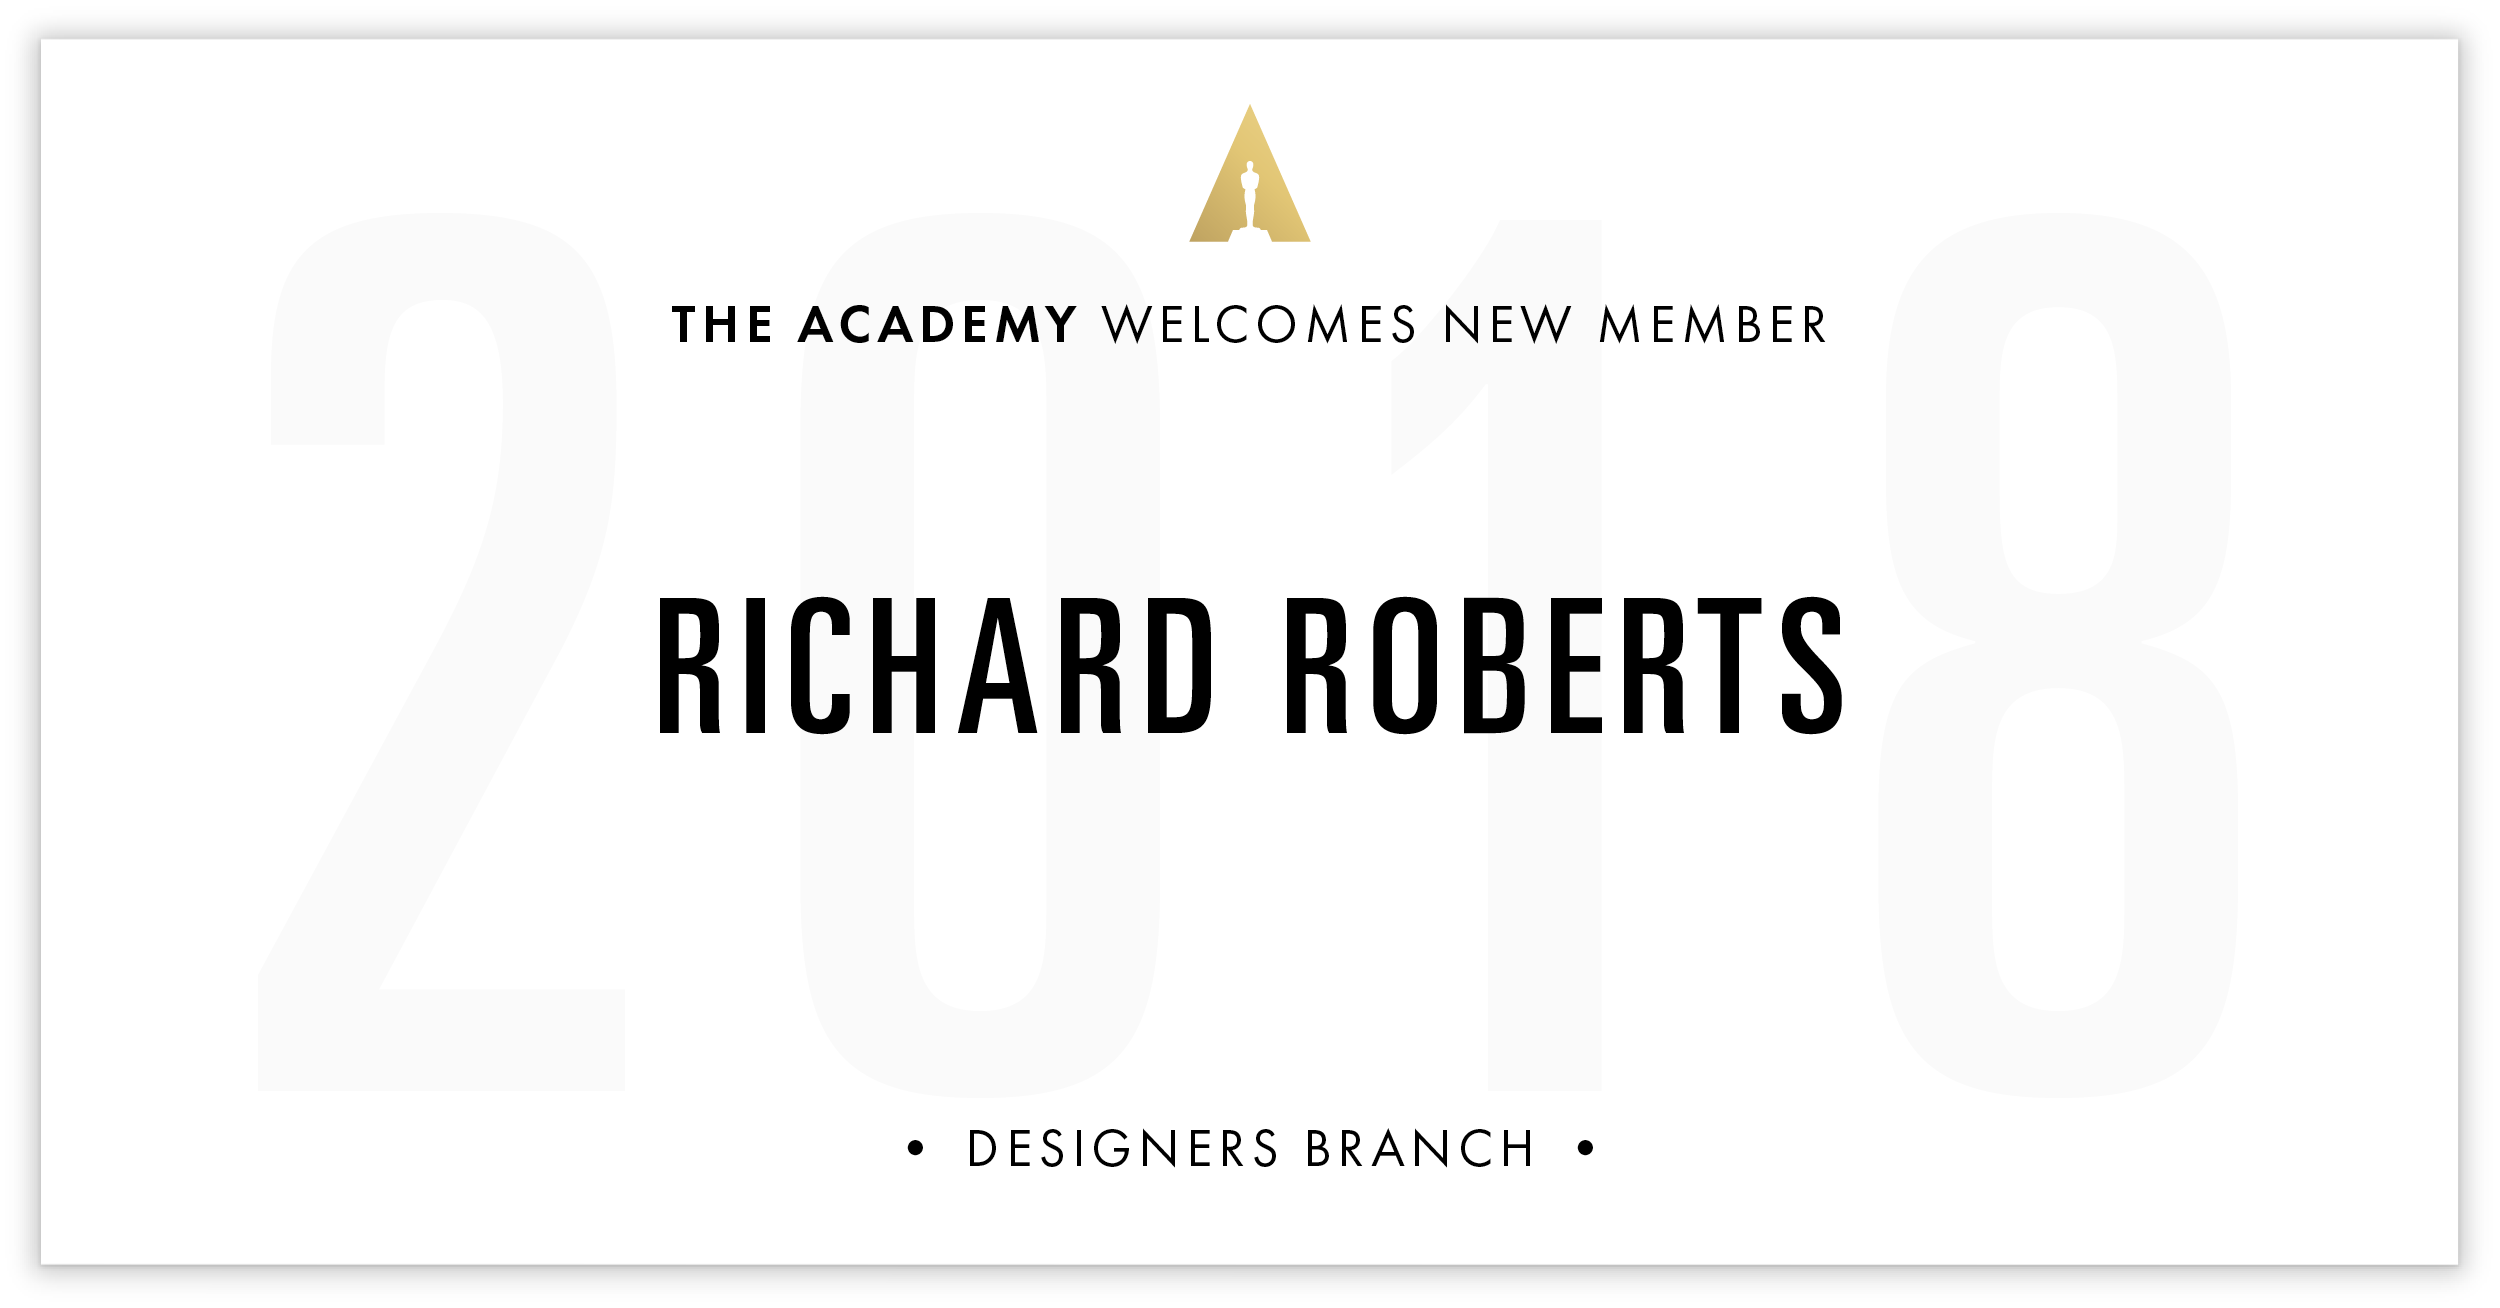 Richard Roberts is invited!